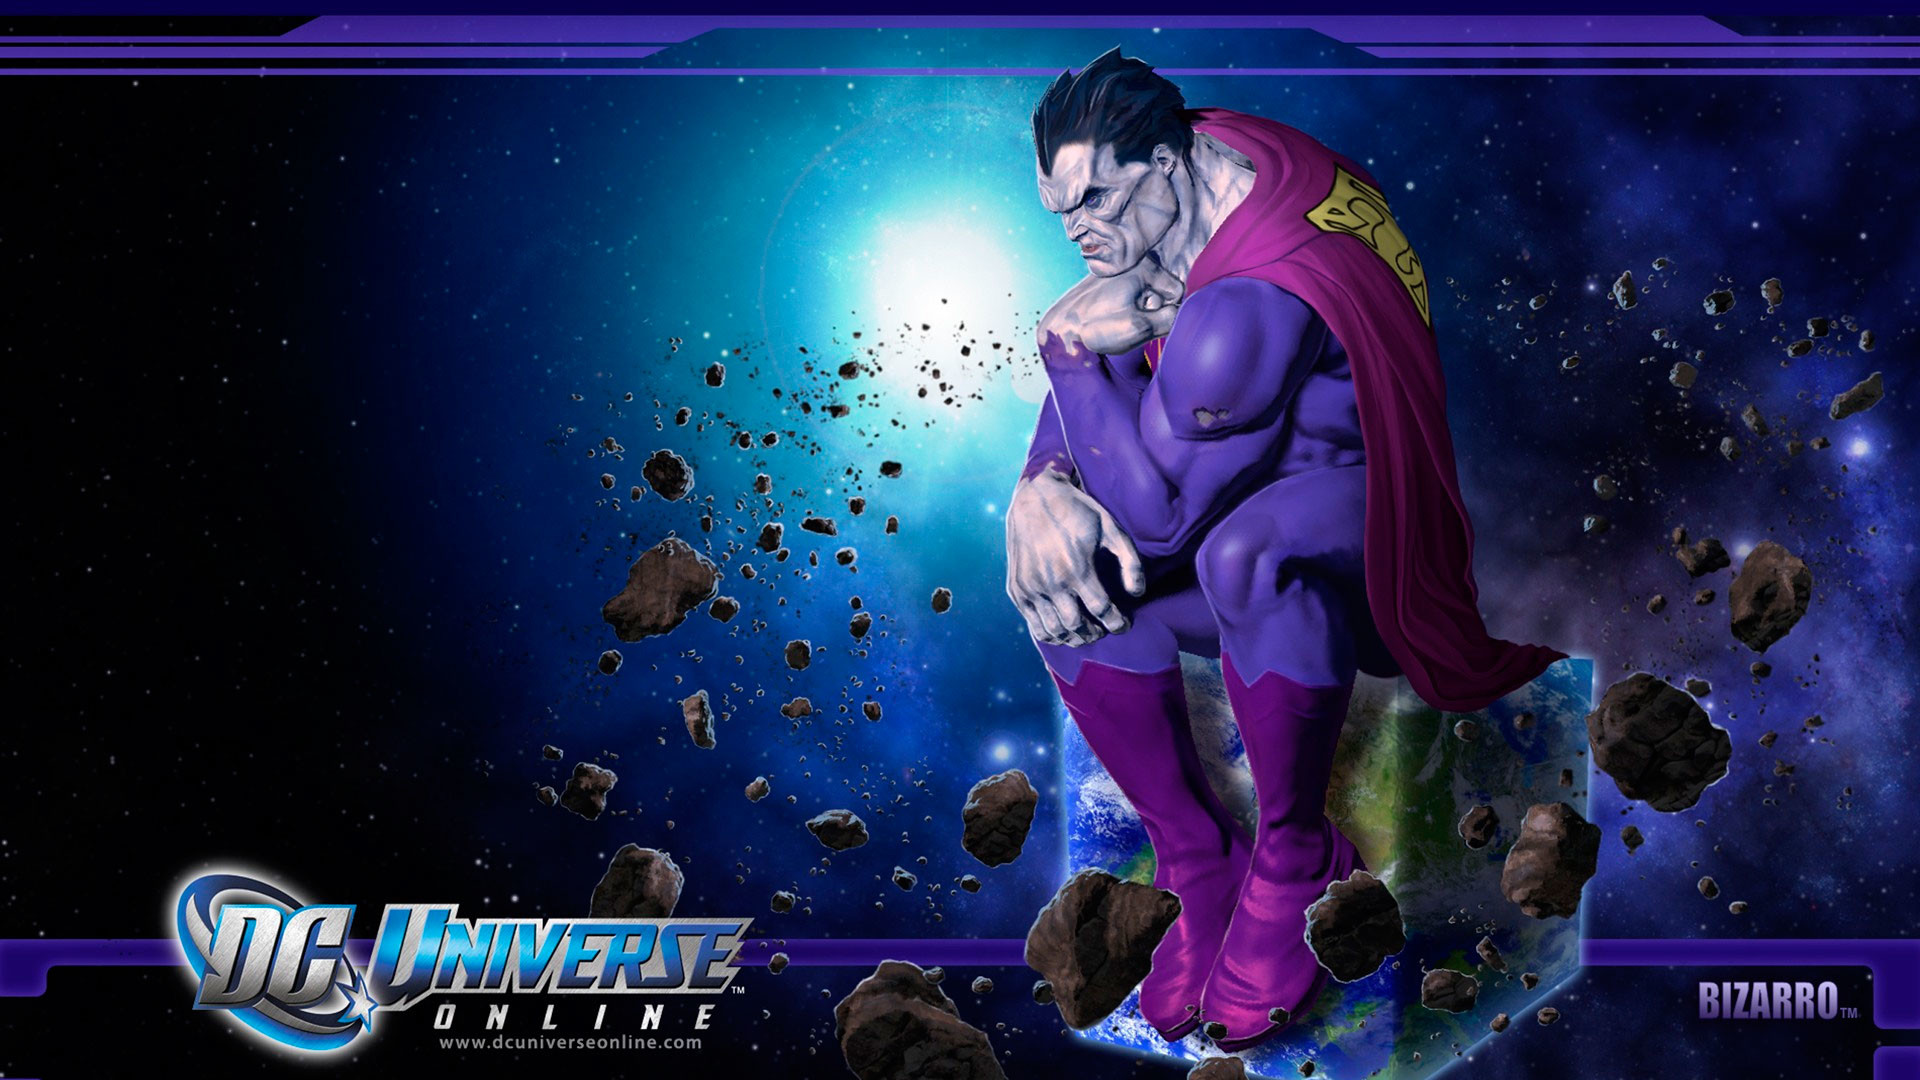 DC Universe Online 1080p Wallpaper DC Universe Online 720p Wallpaper